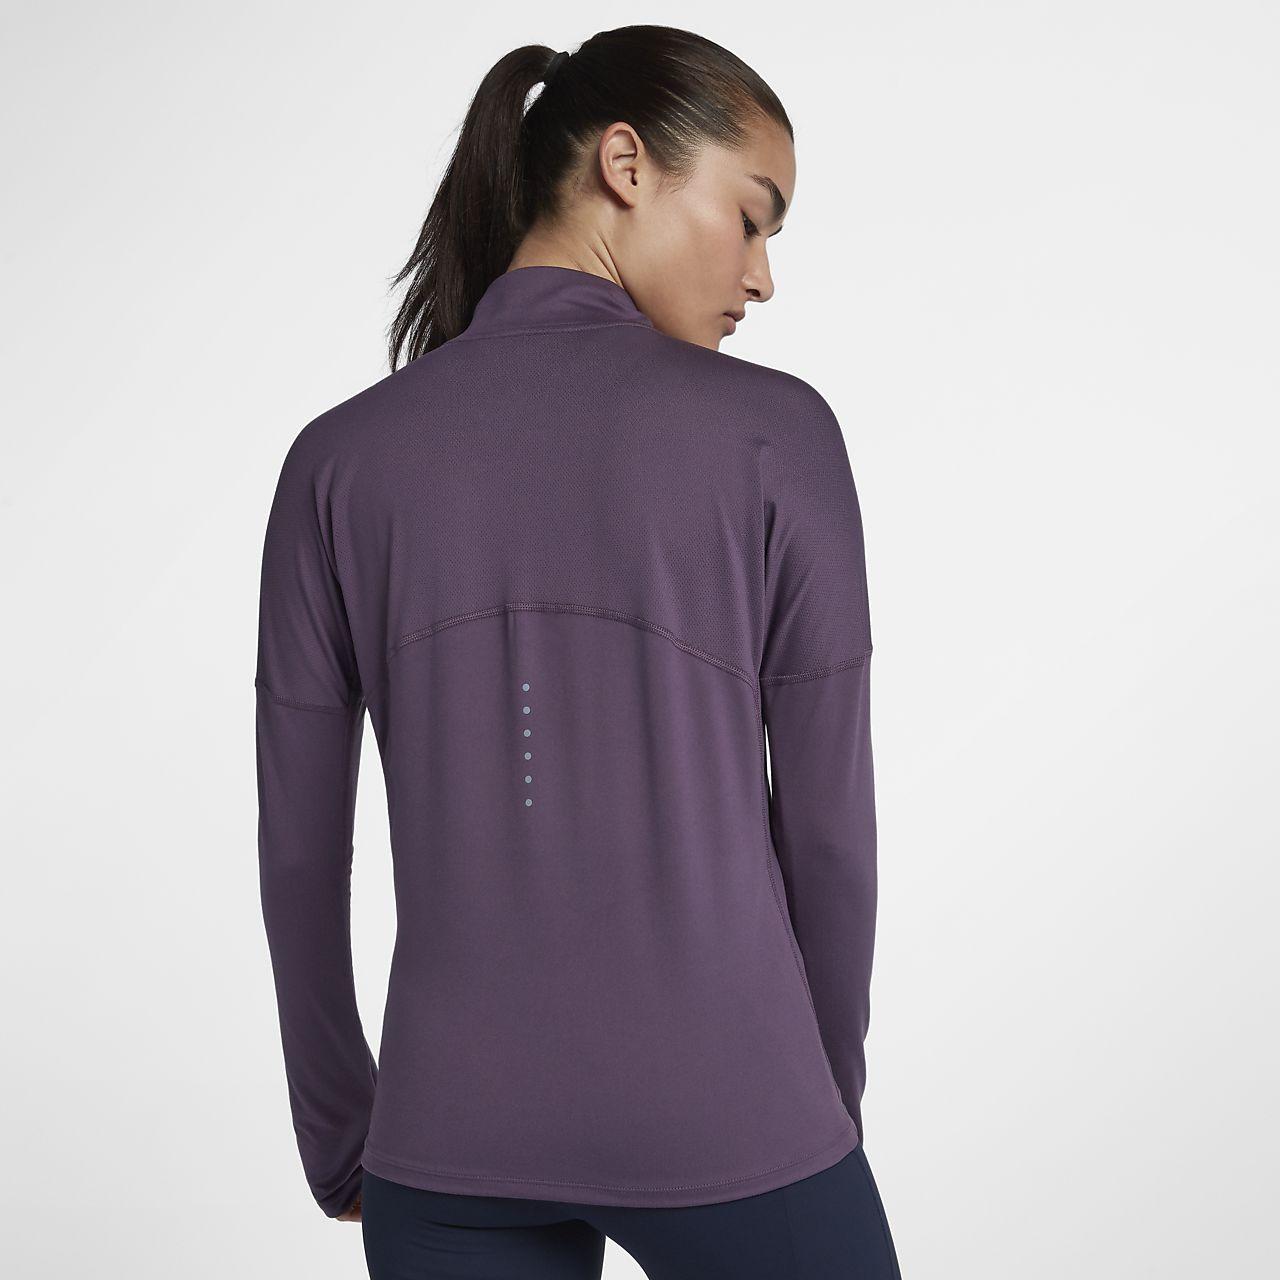 ... Nike Dri-FIT Element Hardlooptop met lange mouwen en halflange rits  voor dames